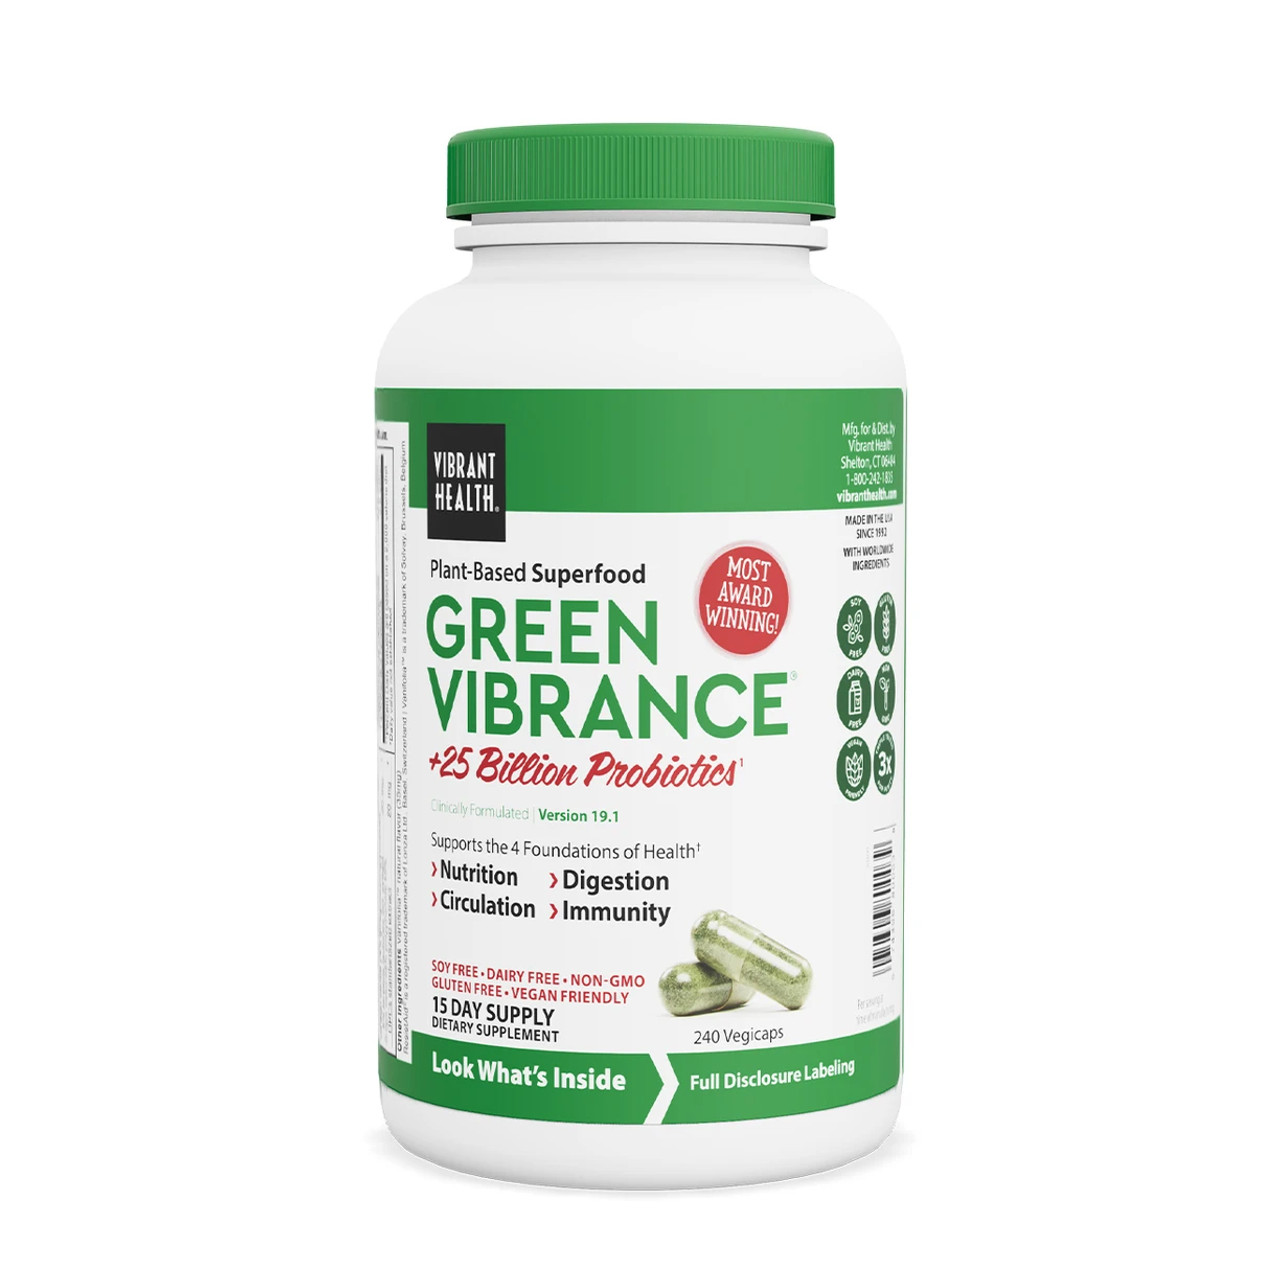 VIBRANT HEALTH® Green Vibrance - 240 vegicaps